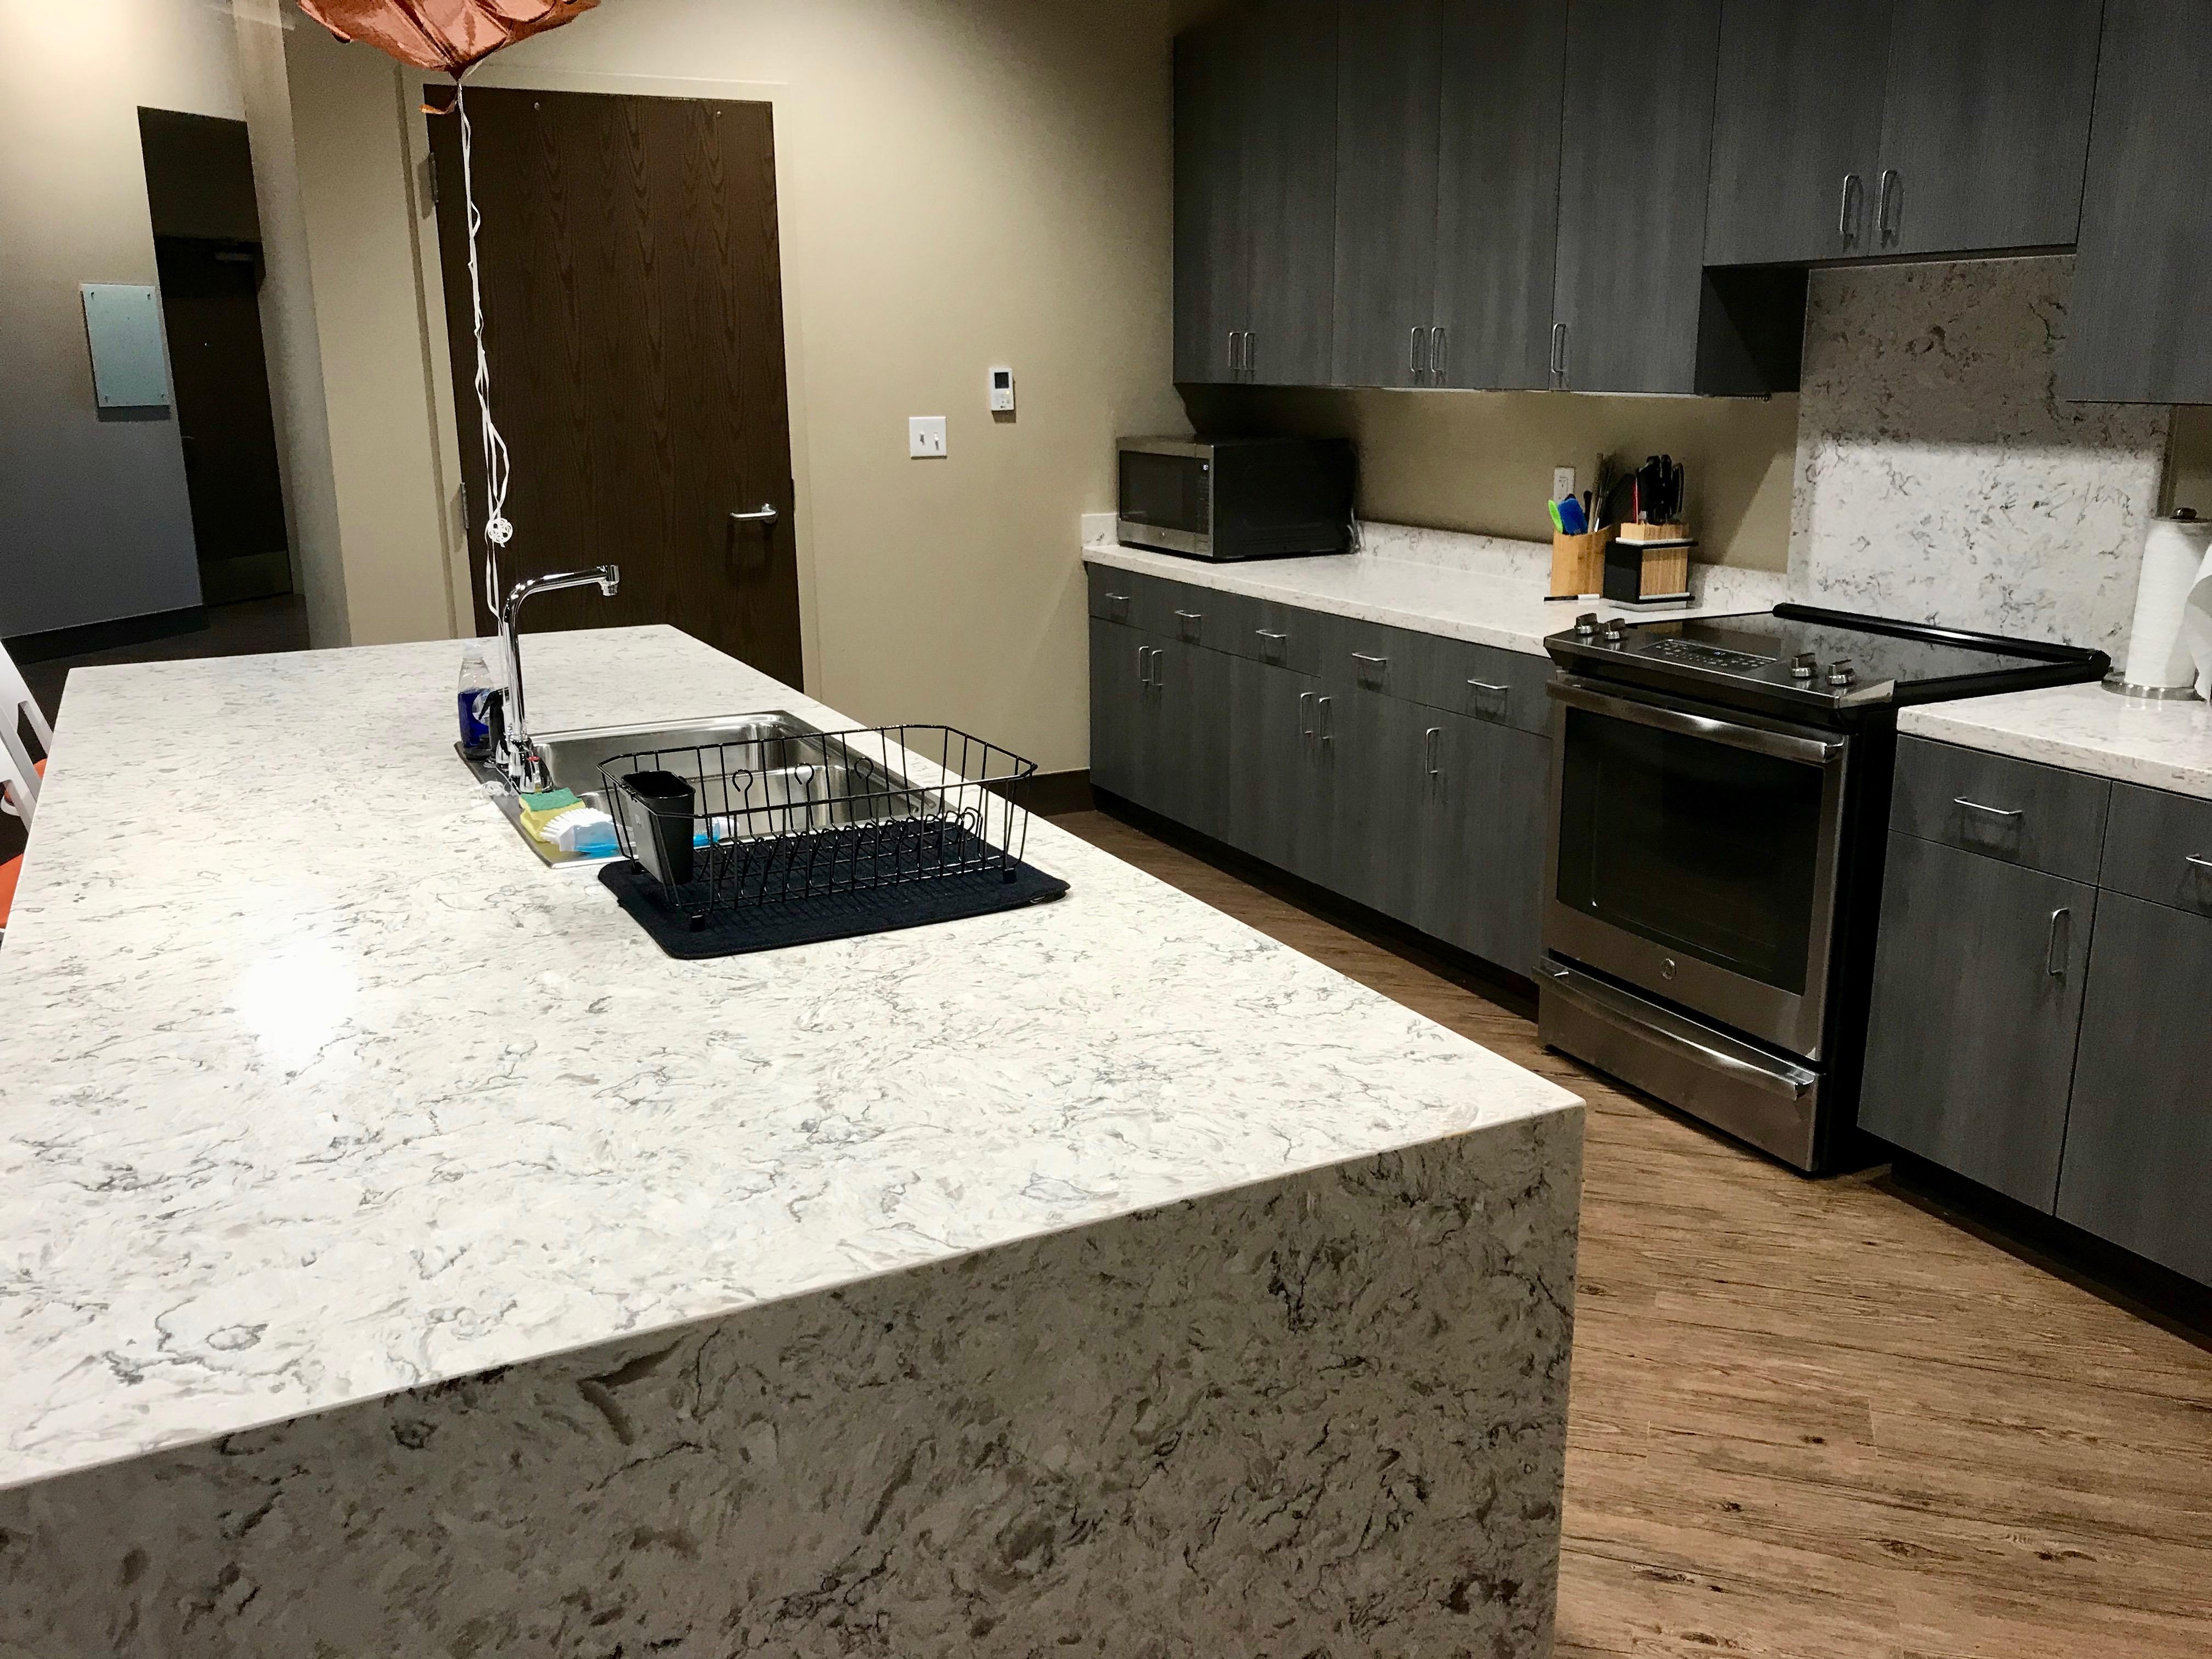 Third floor resident kitchen area